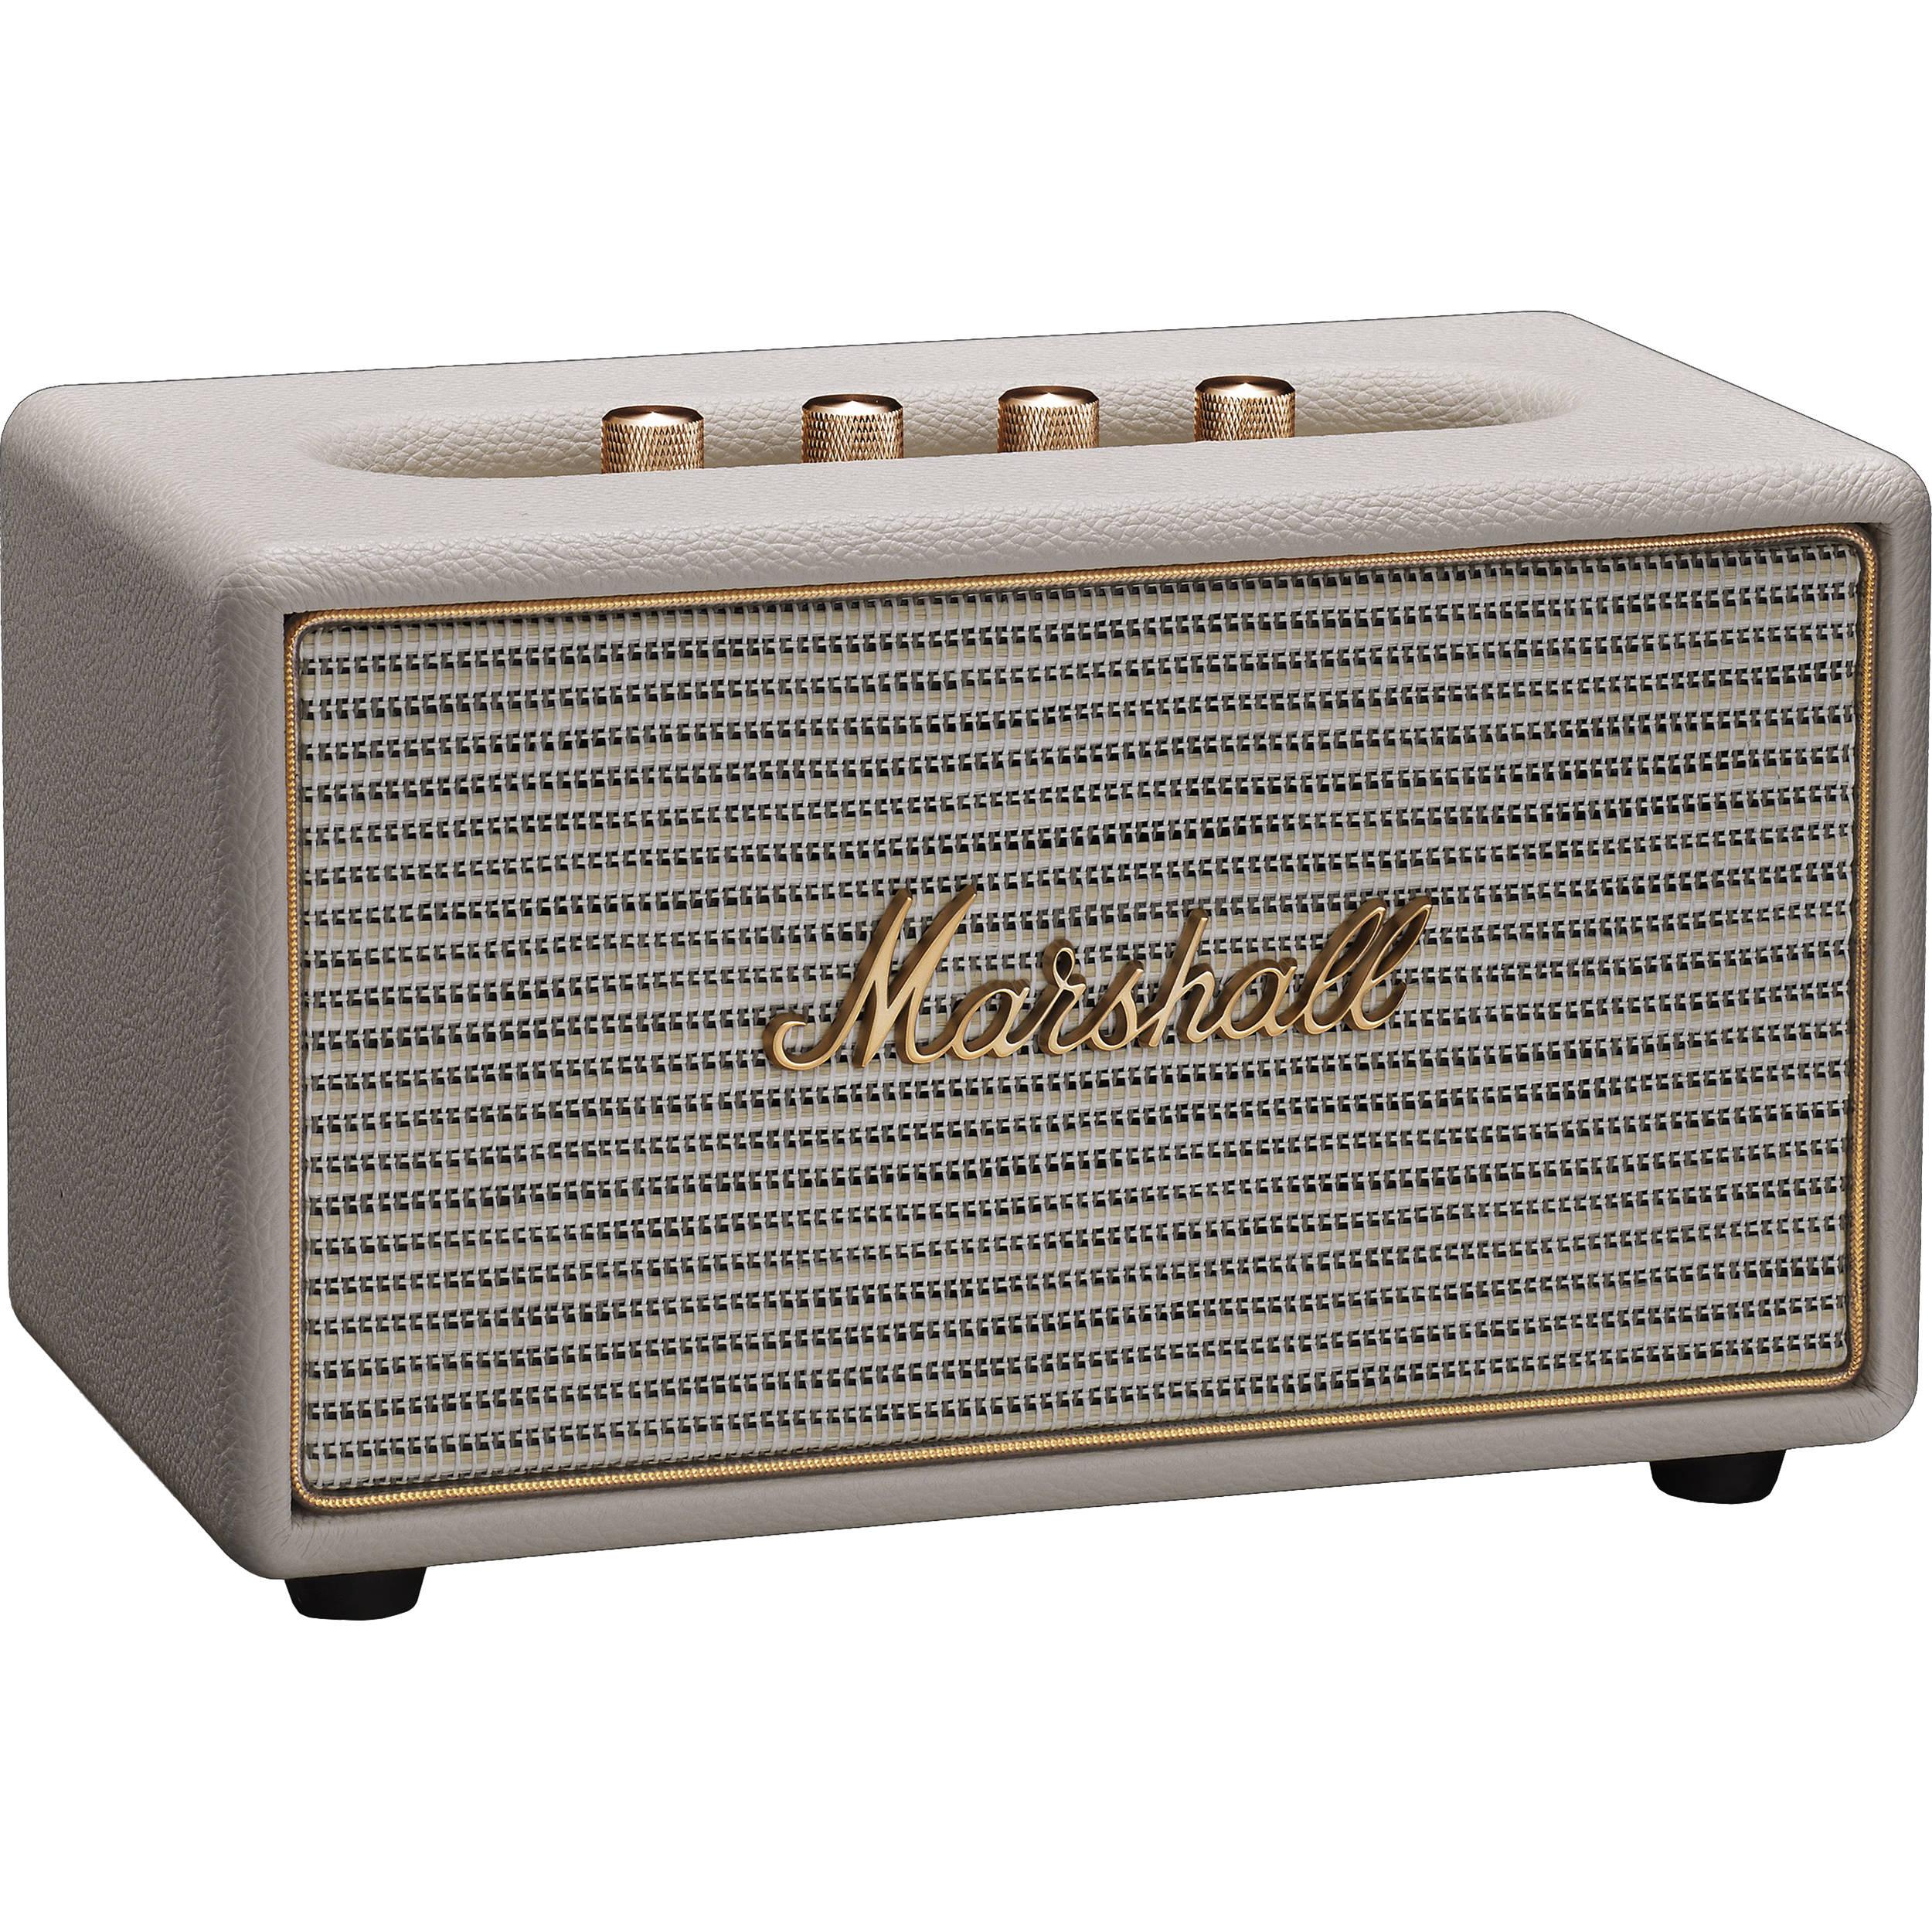 Marshall Acton Multi-Room Wireless Speaker System (Cream)